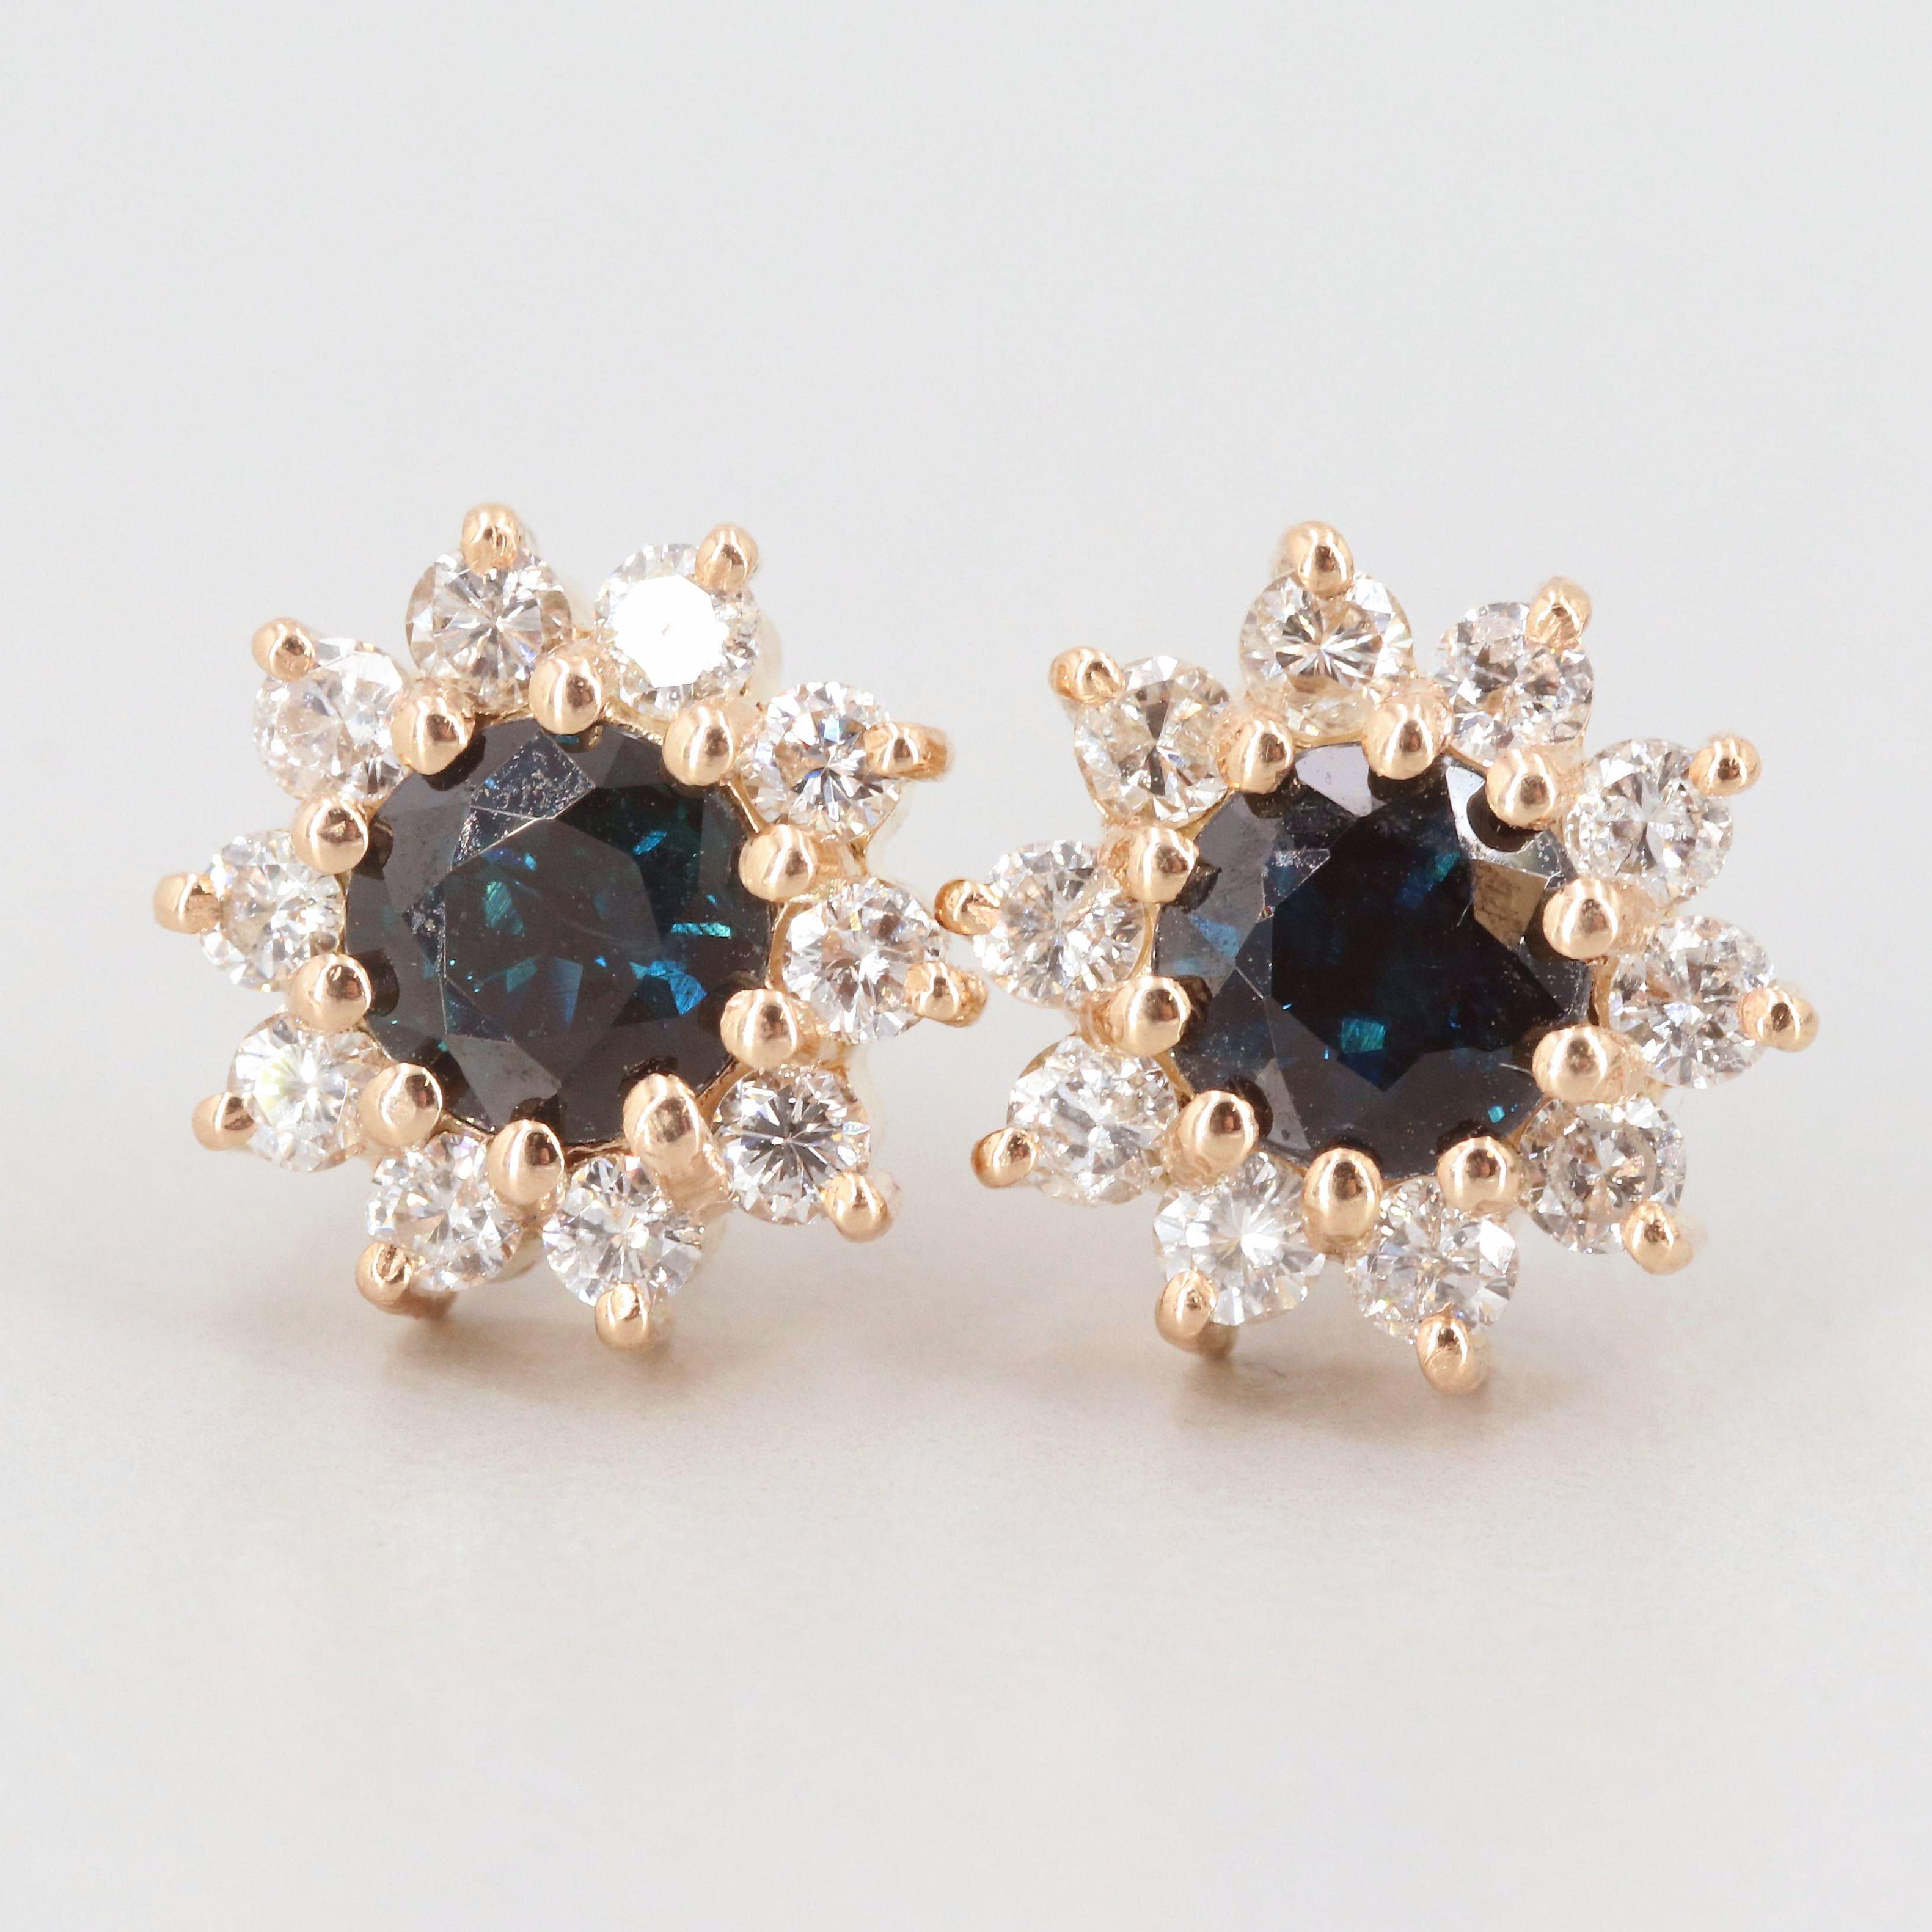 14K Yellow Gold Sapphire and Diamond Stud Earrings